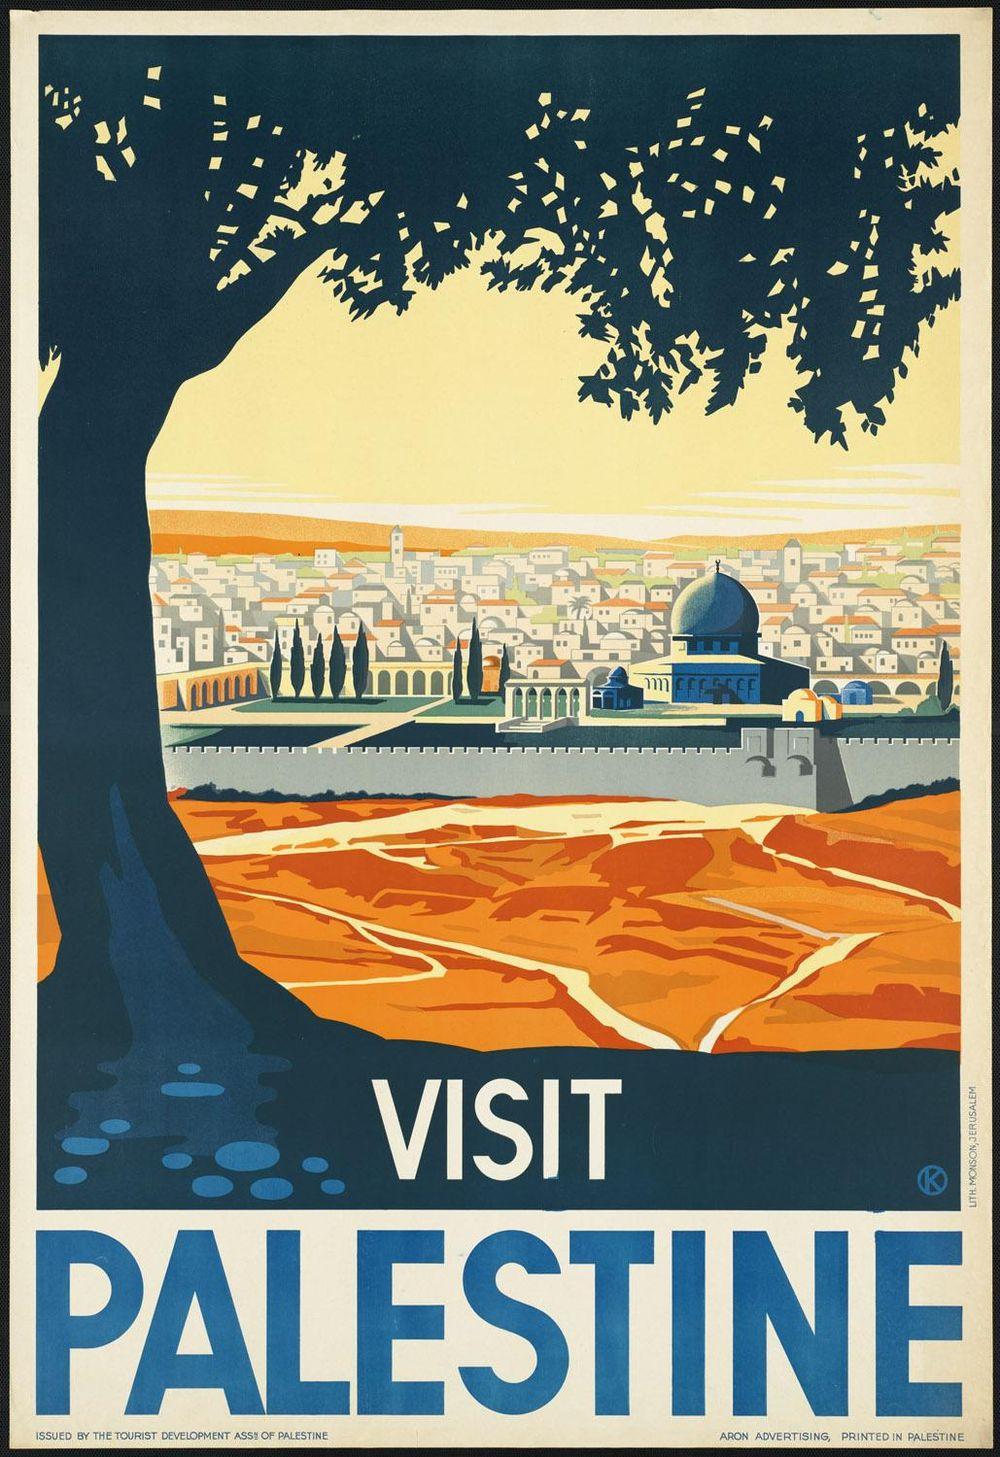 Visit Palestine - image 1 - student project